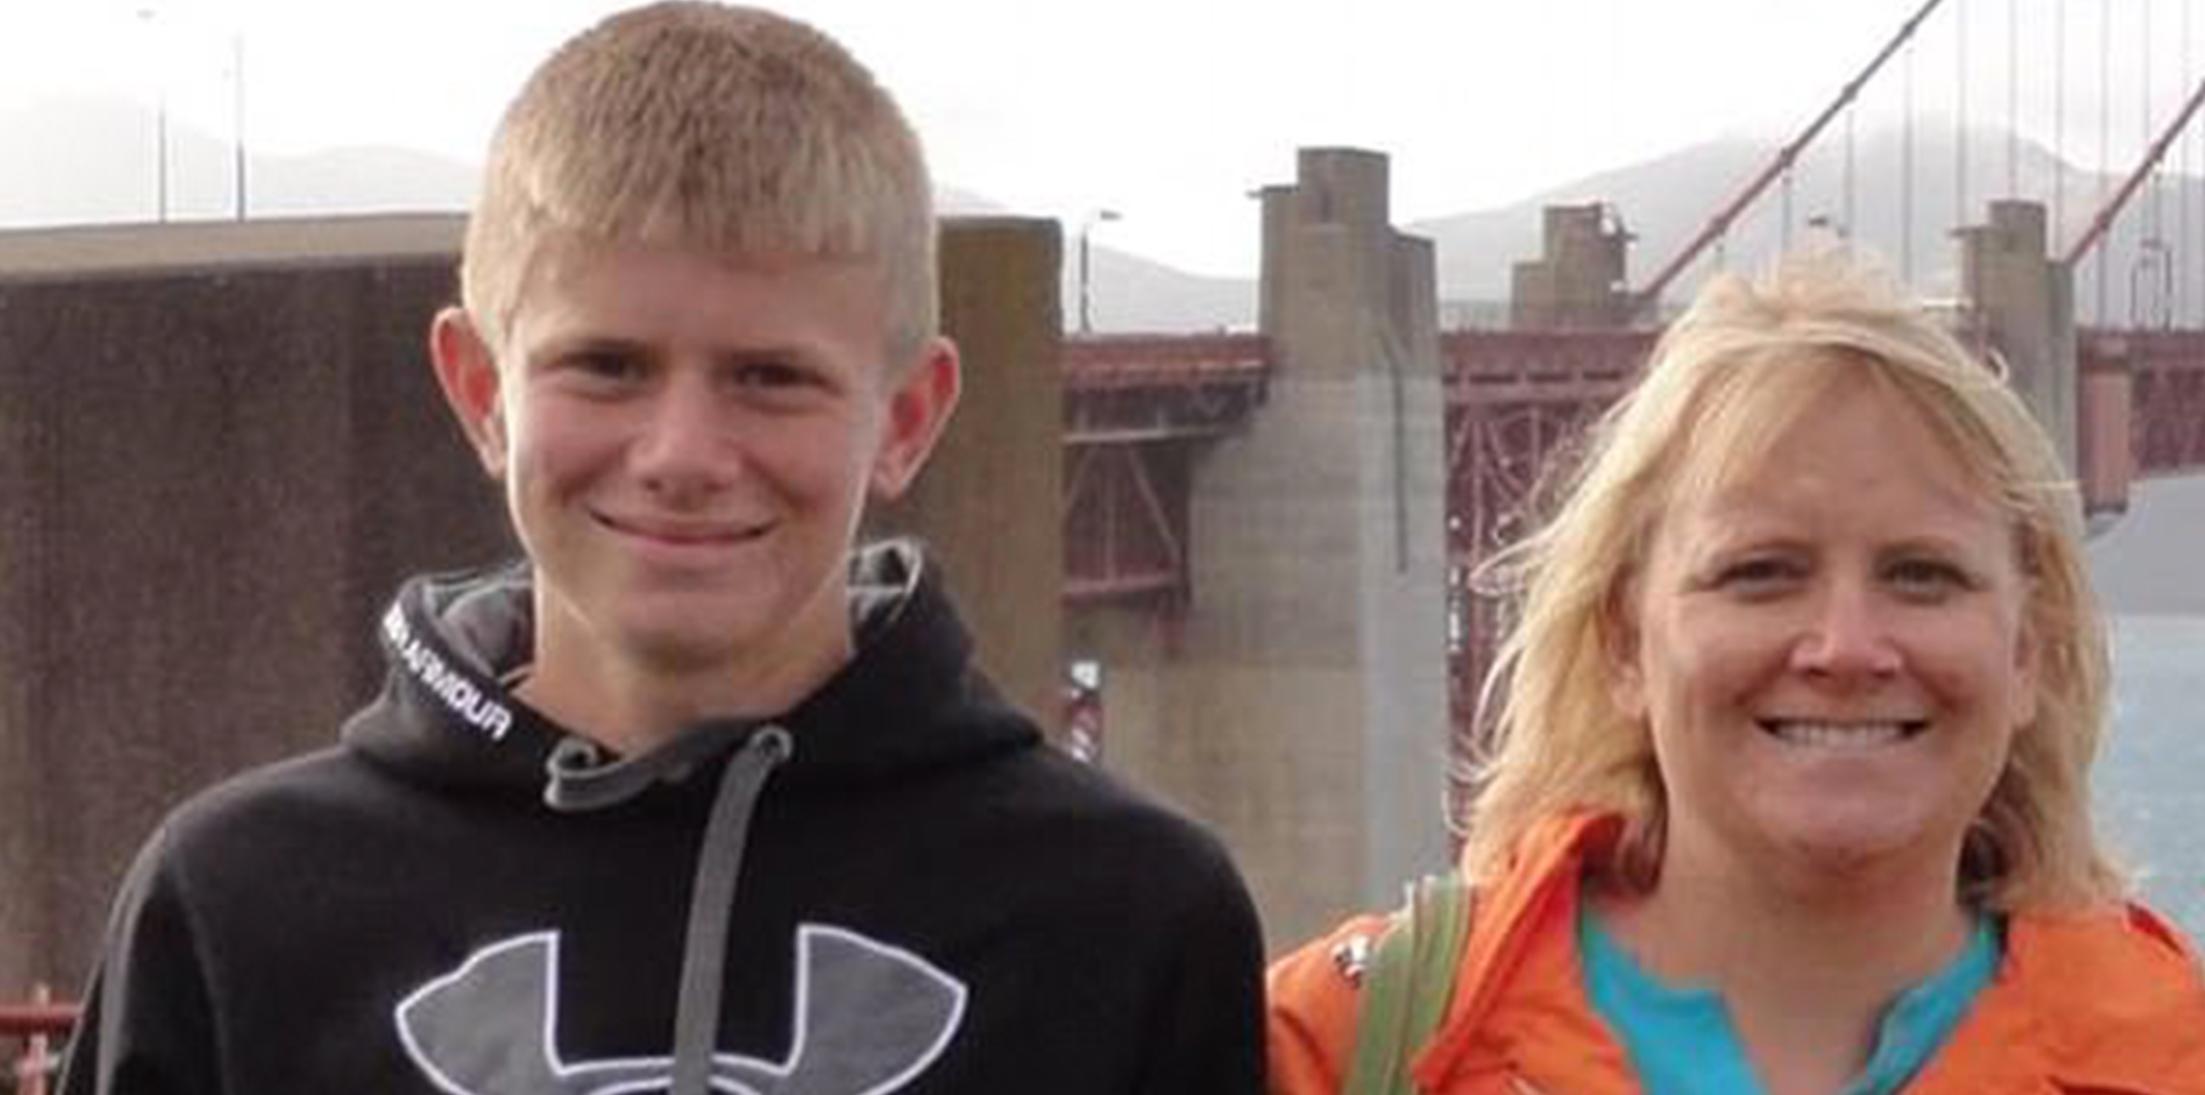 Michigan kid kills mom over puppy feature